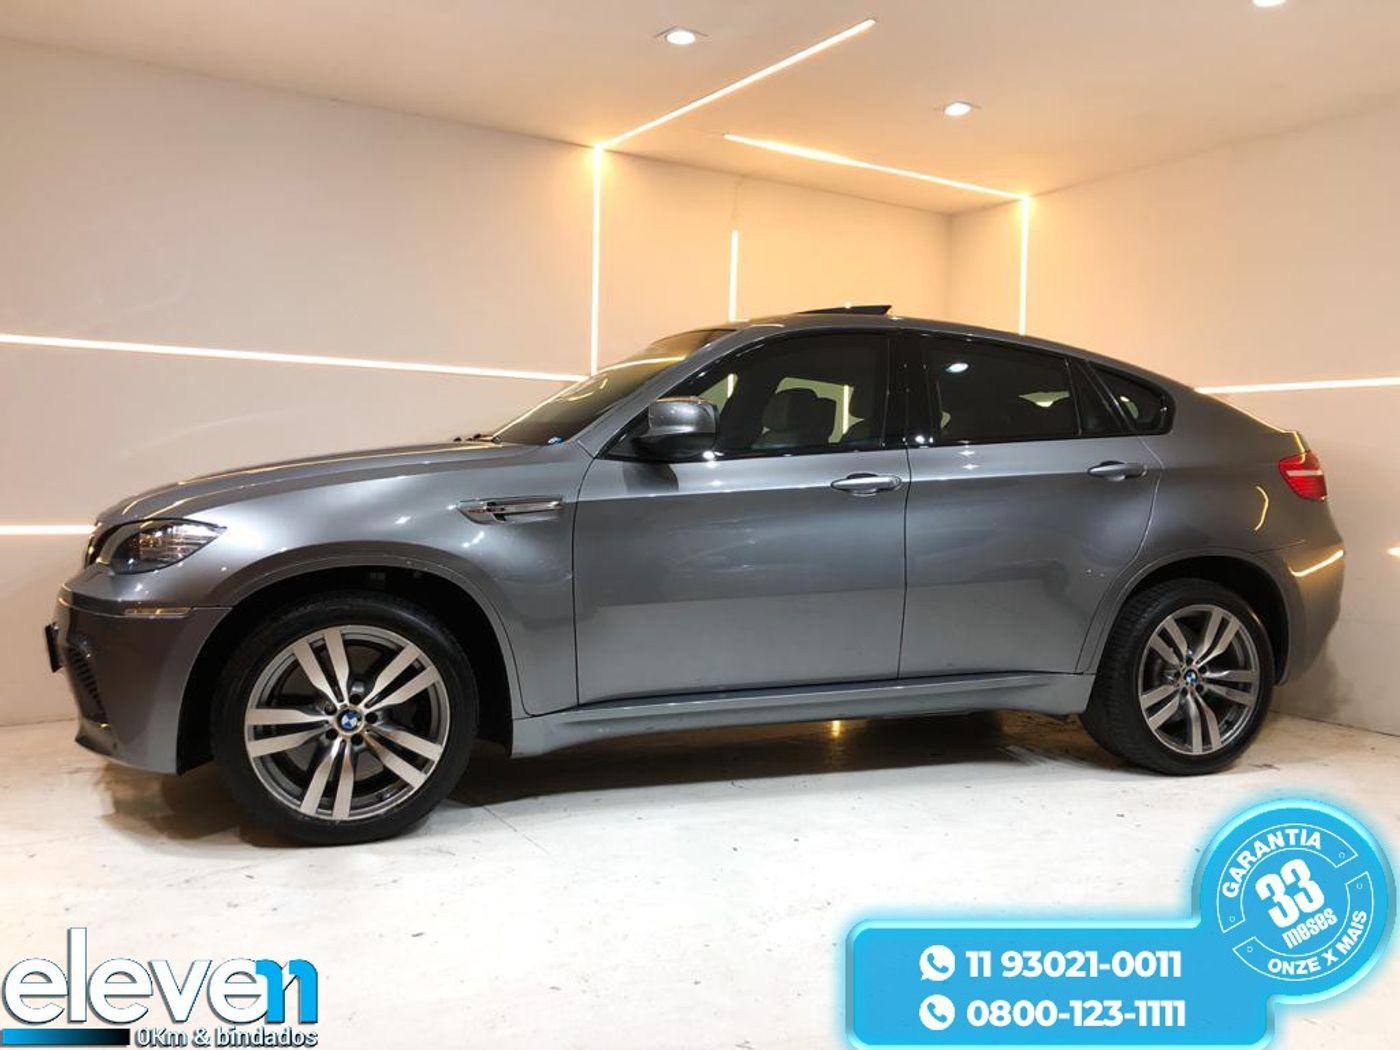 BMW X6 M 4.4 4x4 V8 32V Bi-Turbo Aut.